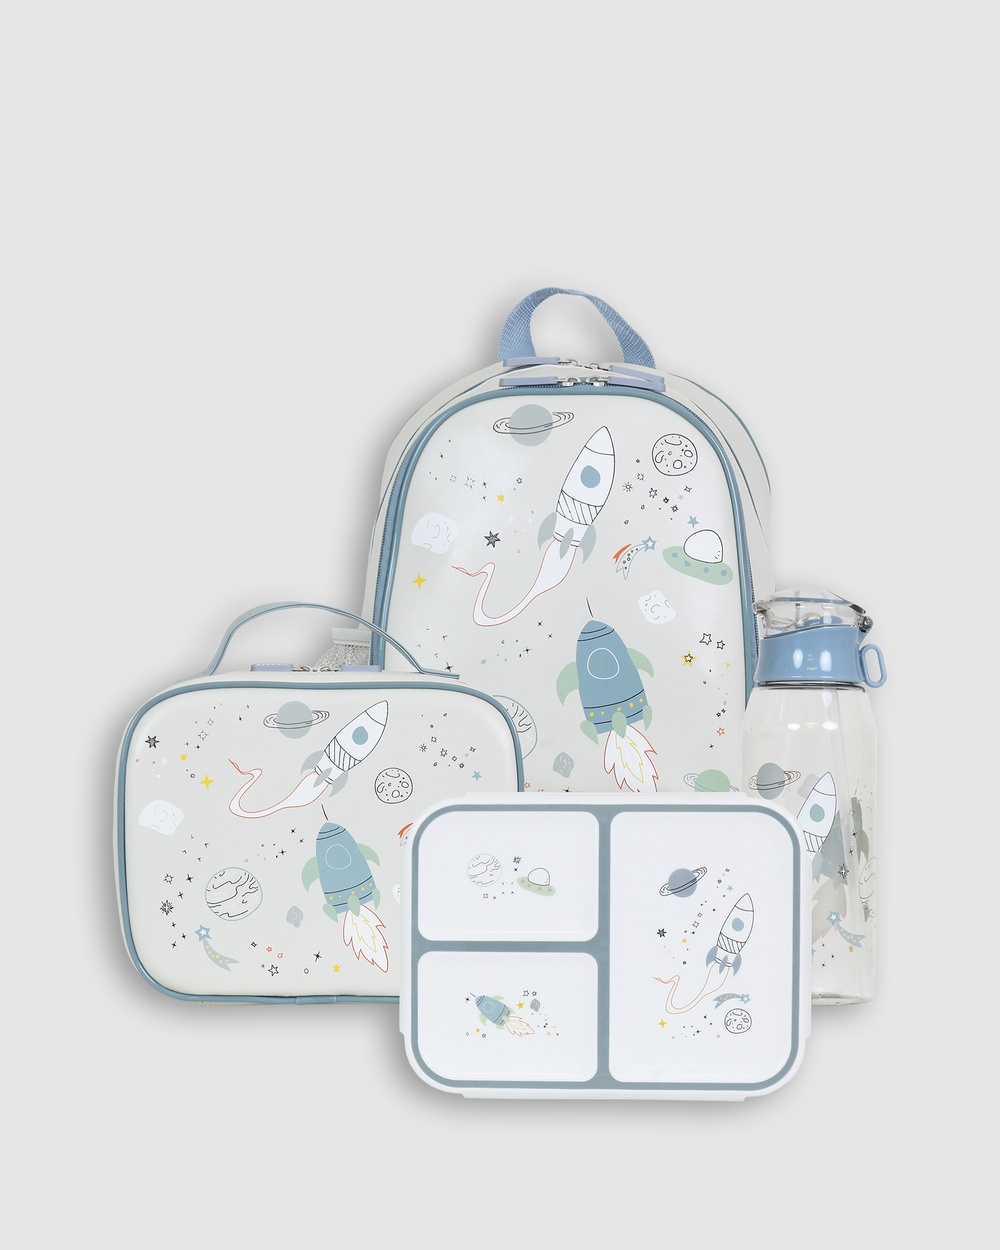 Bobbleart Large Backpack Lunch Bag Bento Box and Drink Bottle Space Backpacks Light Grey